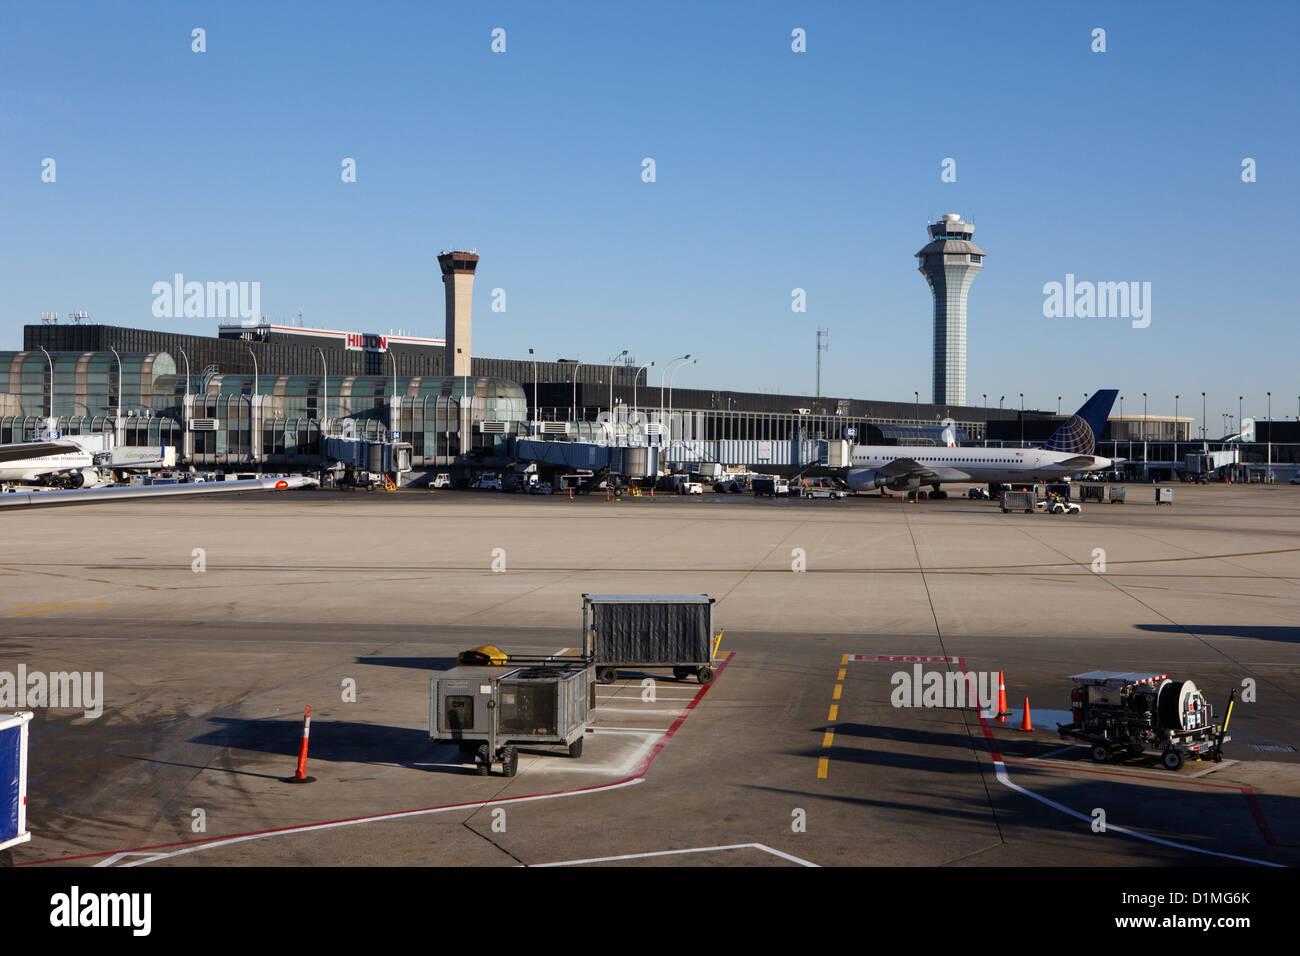 L'aéroport international O'Hare Chicago Illinois USA Photo Stock